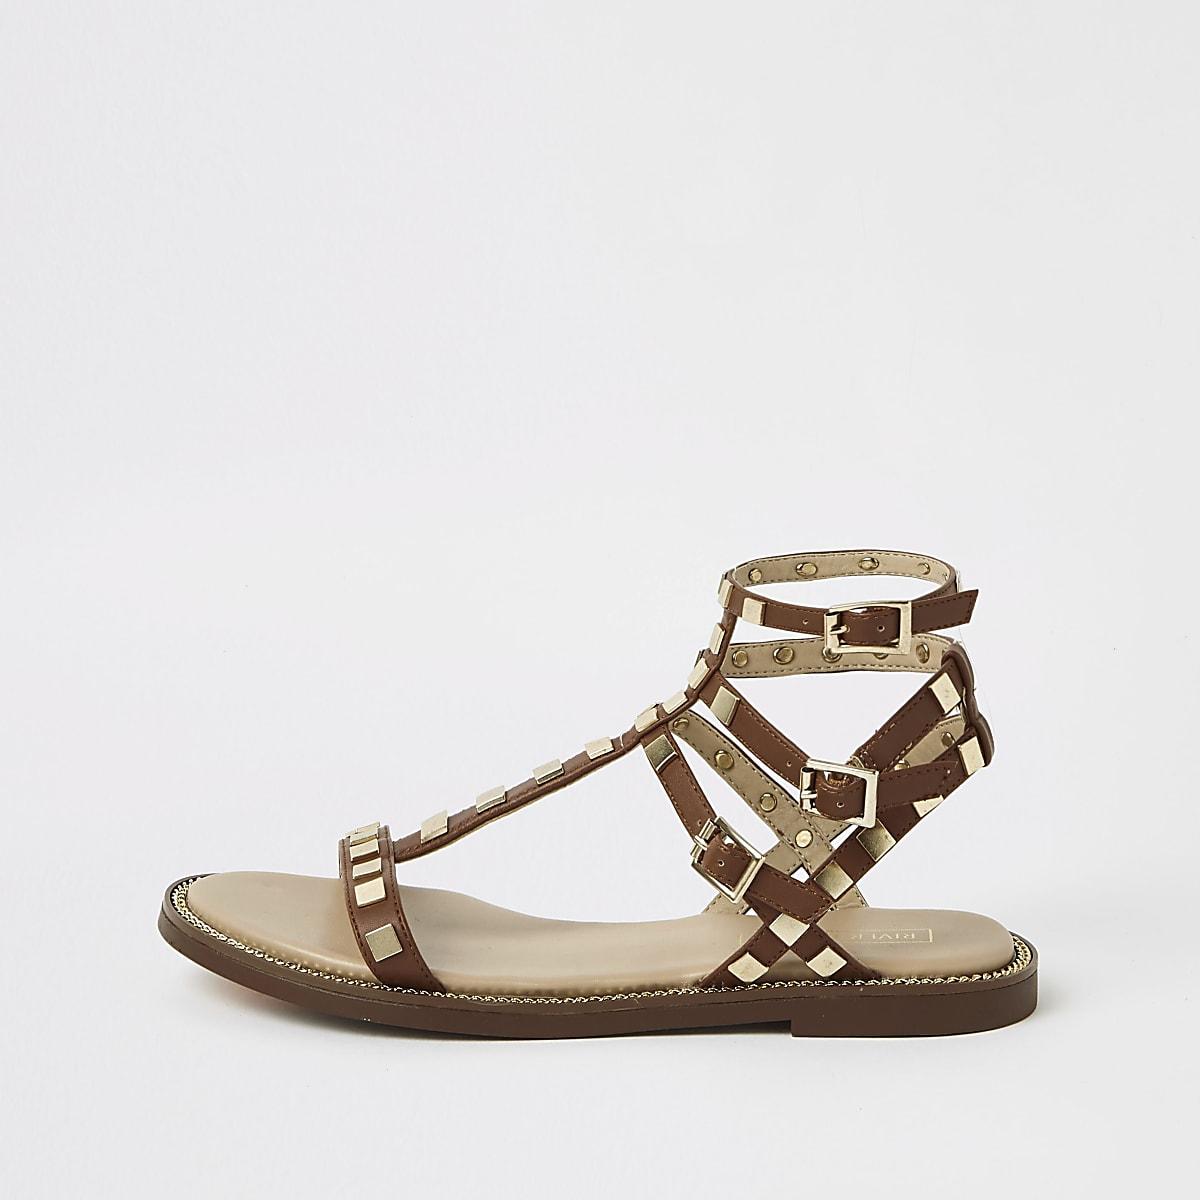 Brown studded wide fit gladiator sandals